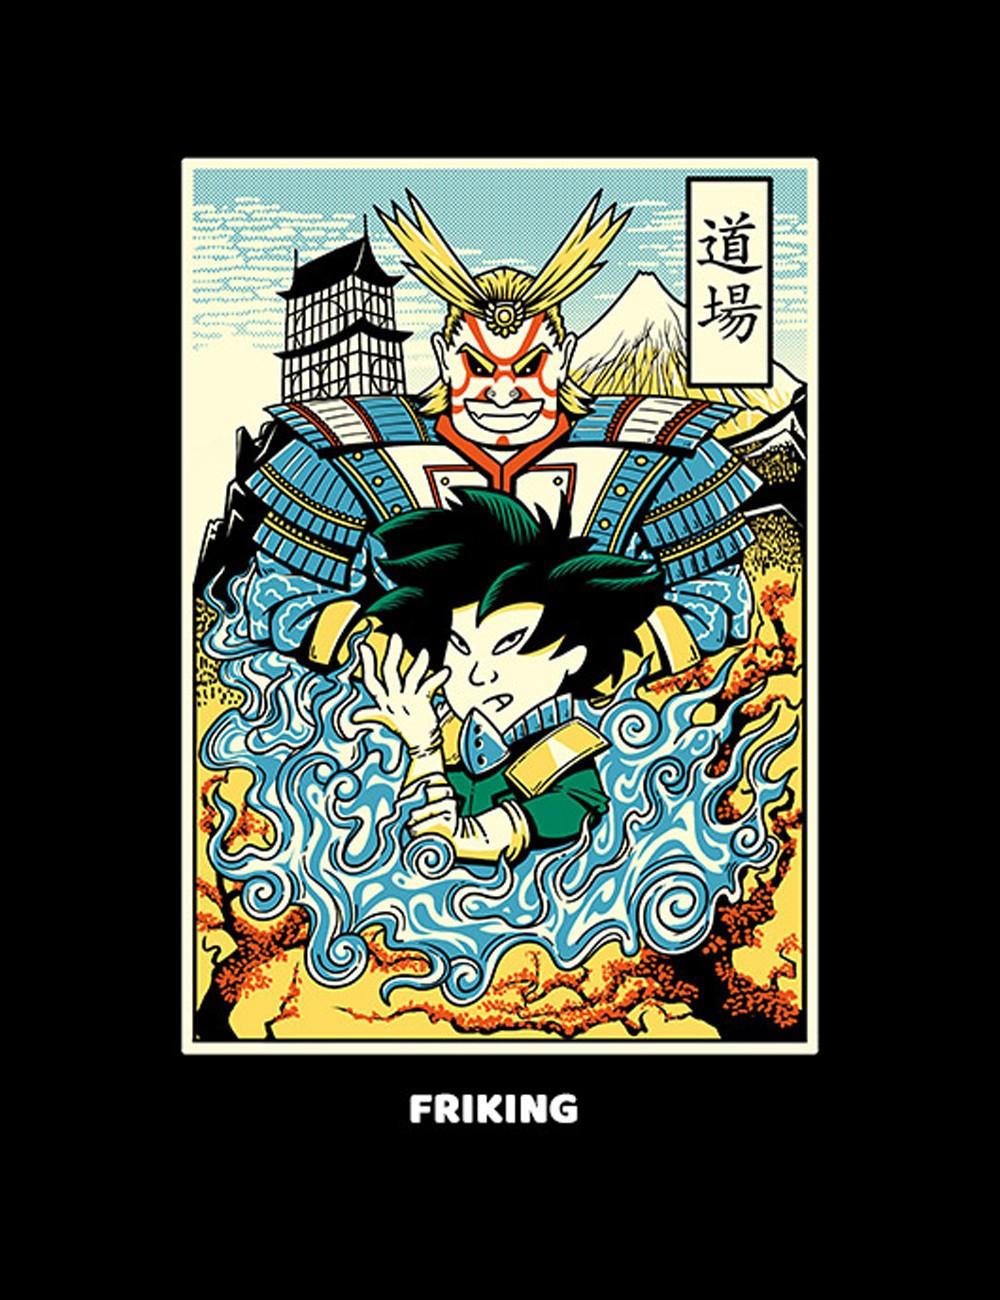 Ukiyo e-hero